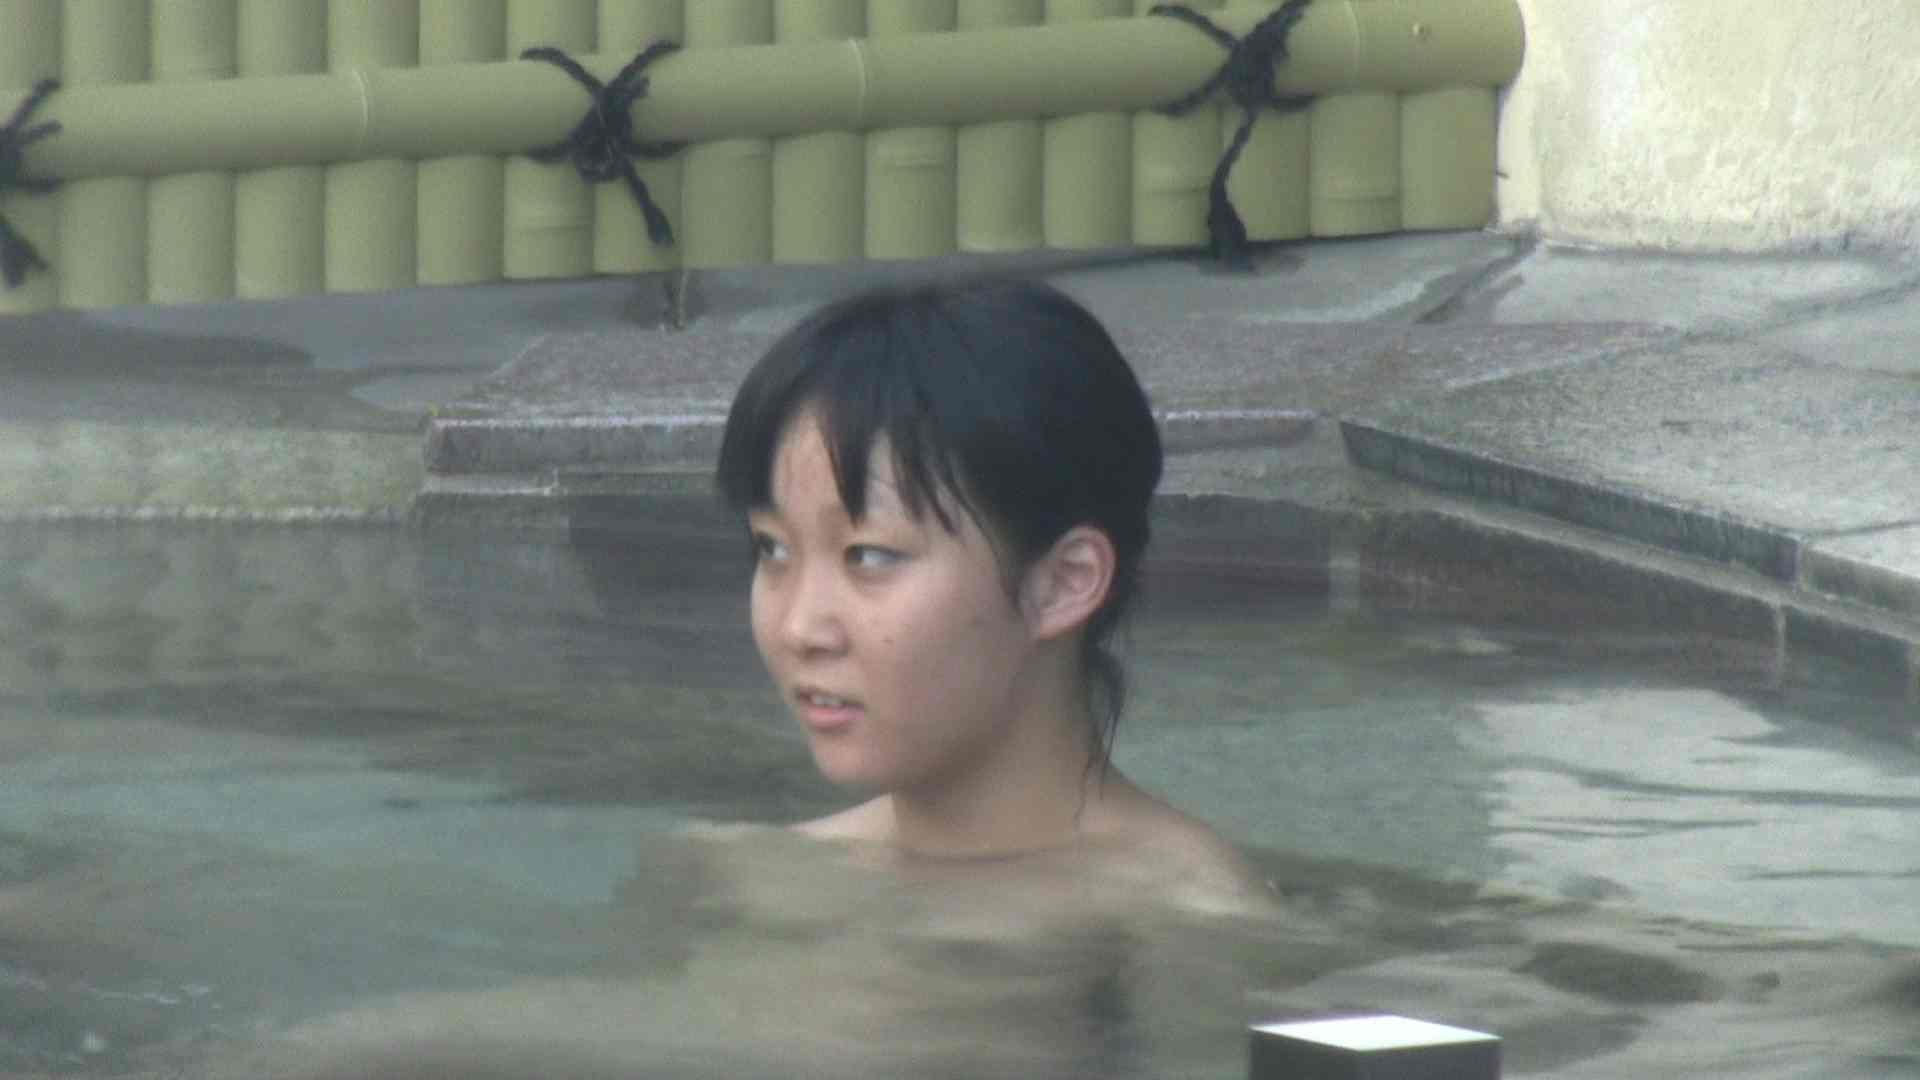 Aquaな露天風呂Vol.196 盗撮シリーズ | 露天風呂編  87PIX 13